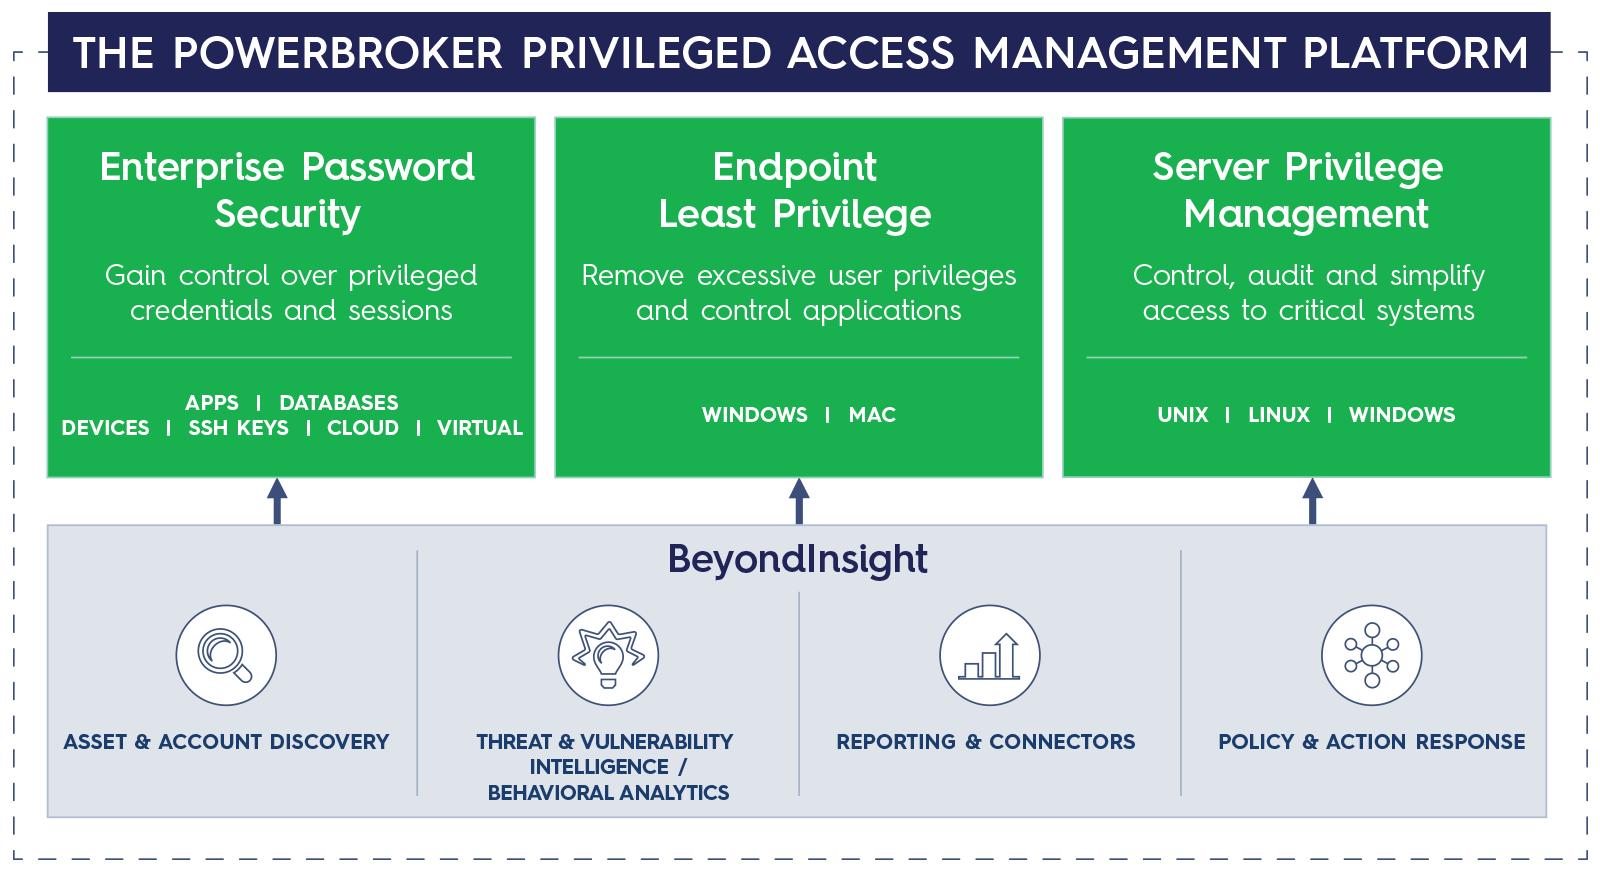 The Powerbroker Privileged Access Management Platform